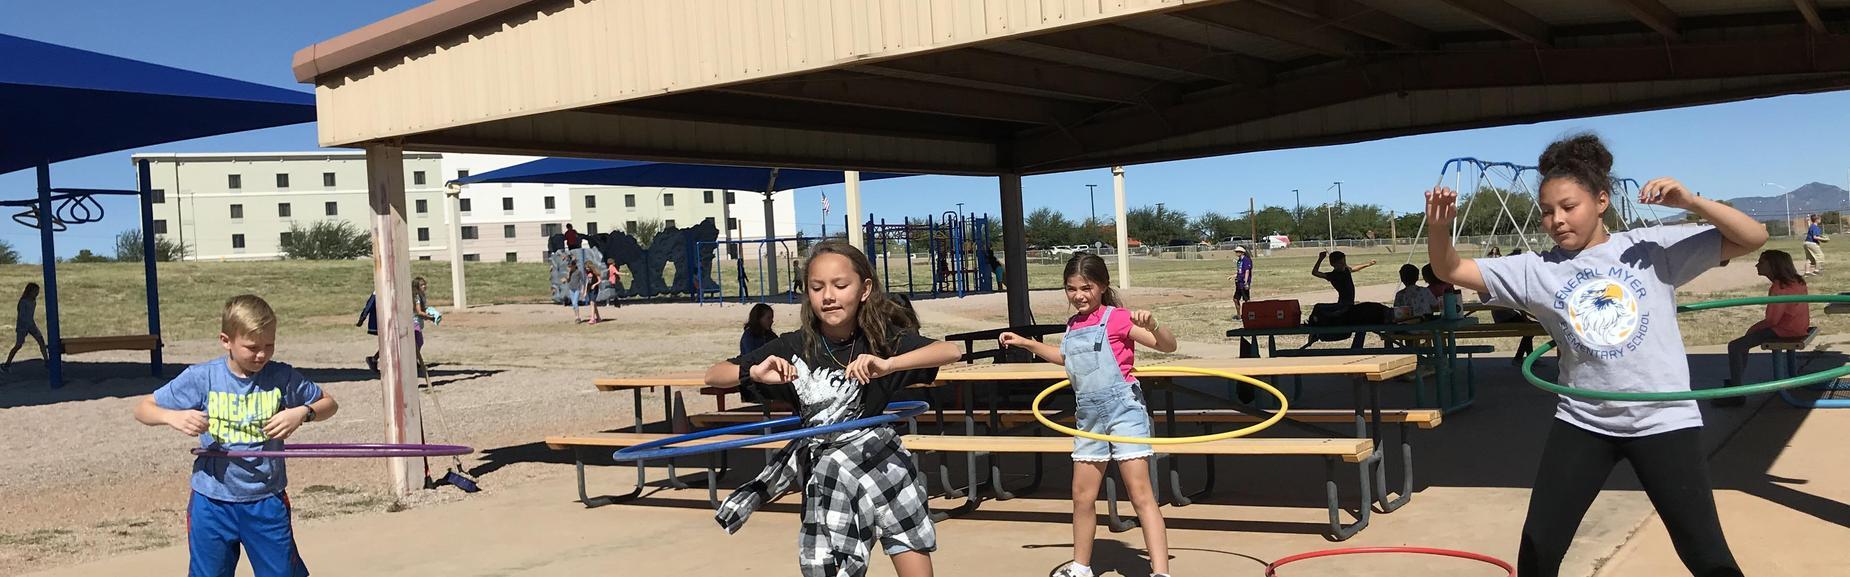 girls with hula hoops